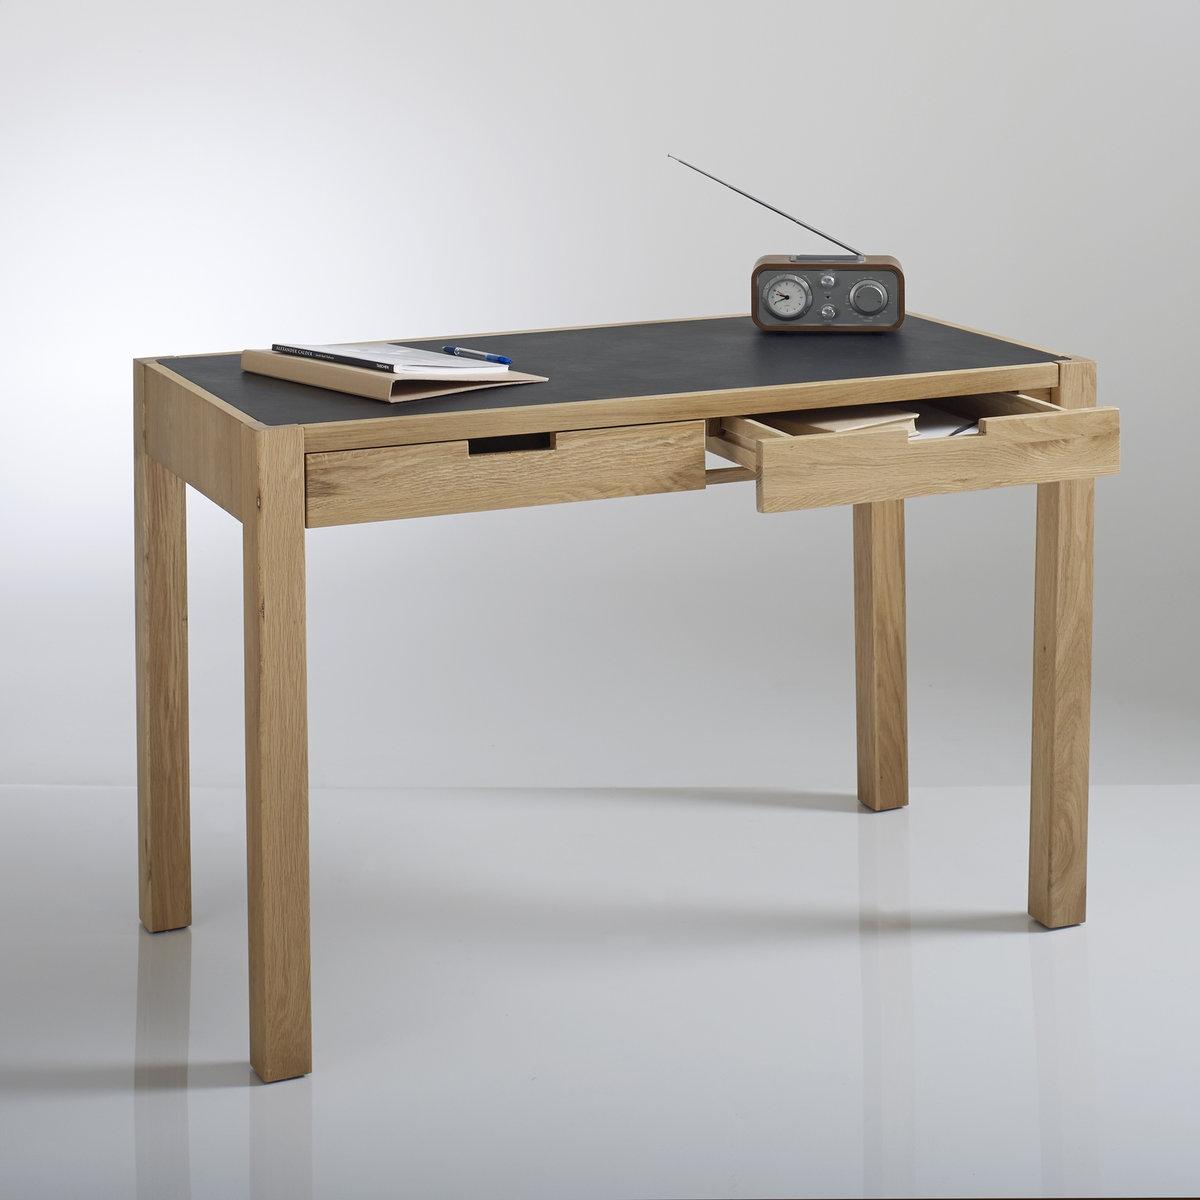 Стол письменный со столешницей под кожу, 2 ящика, Watford от La Redoute